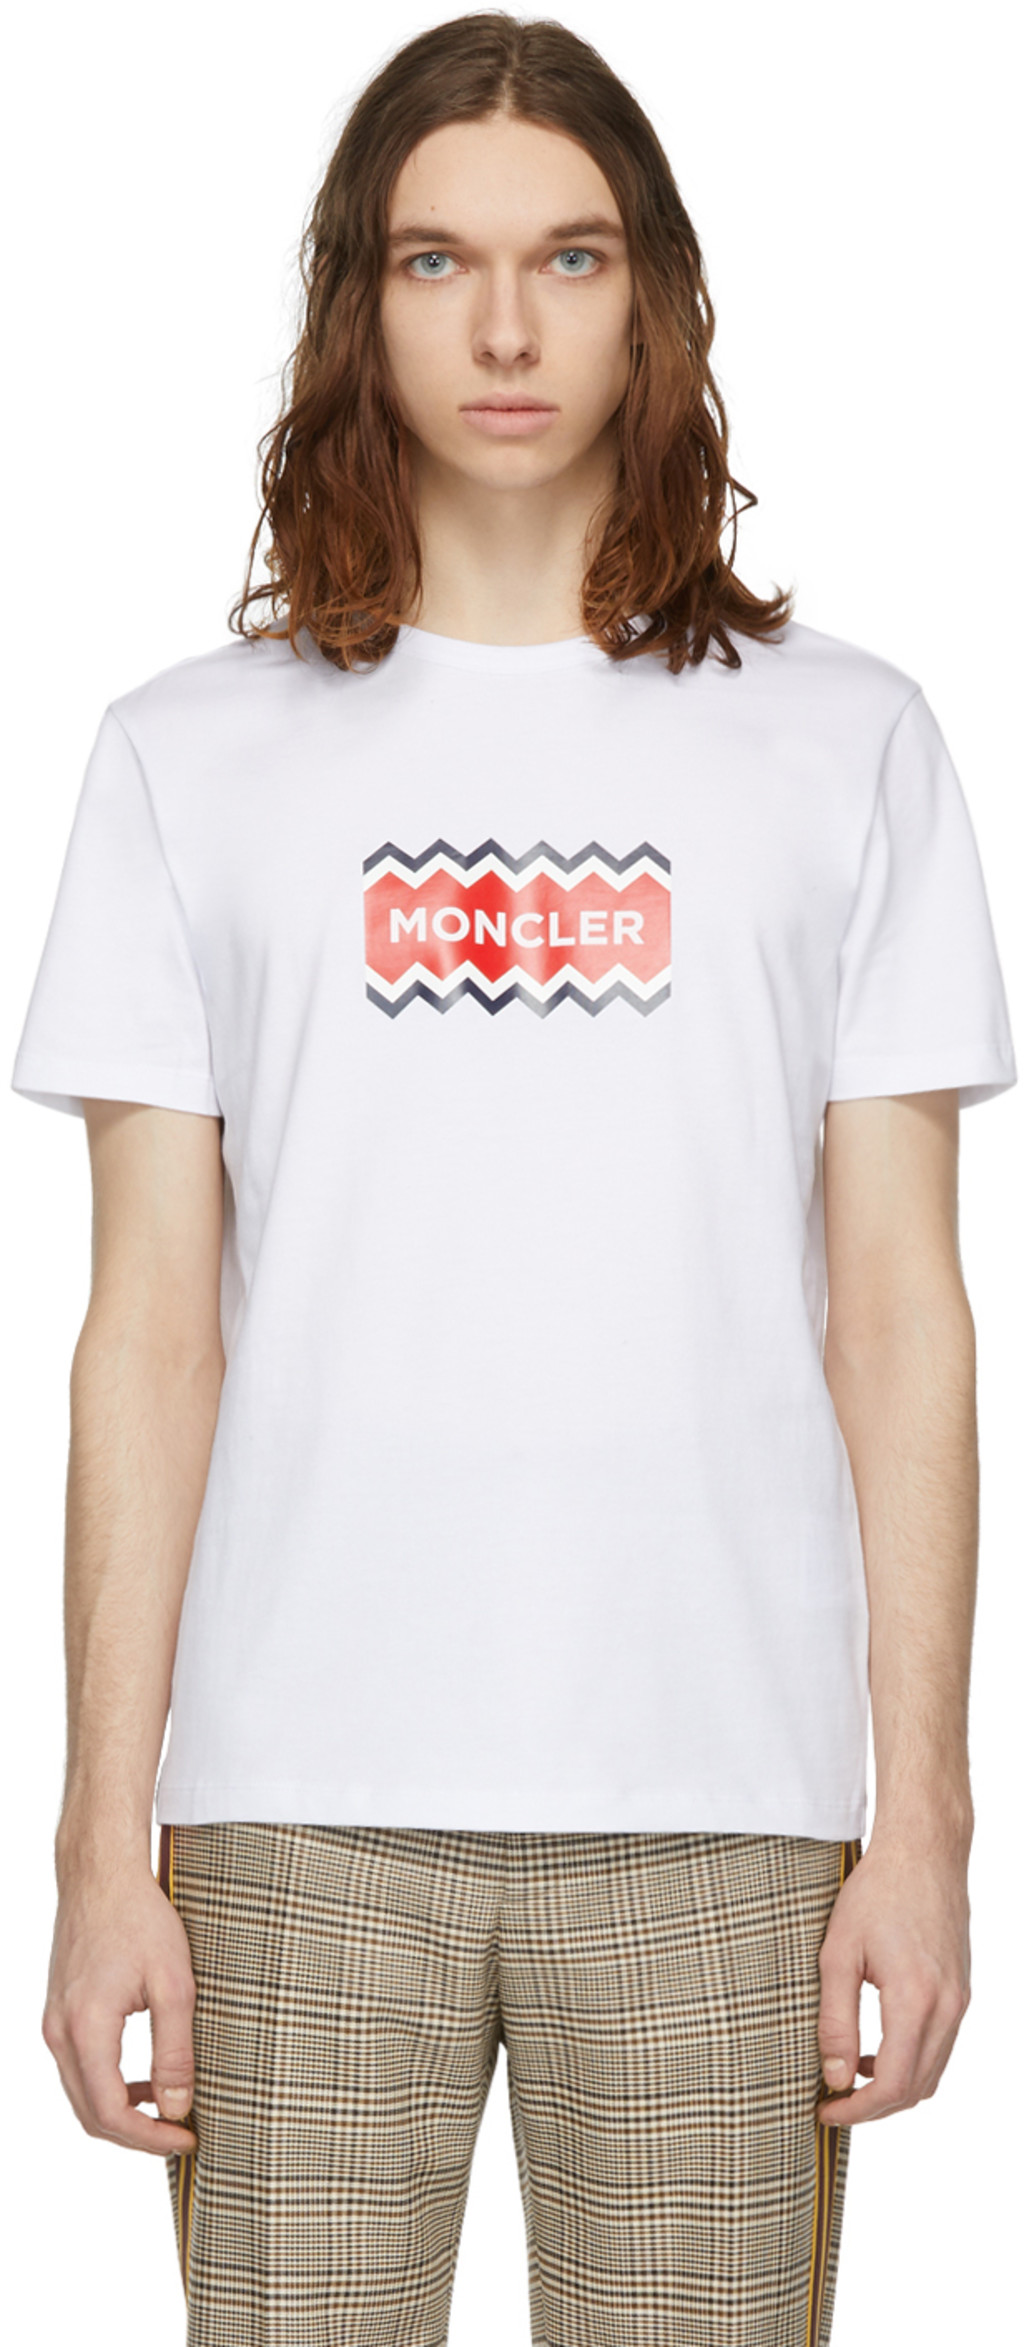 65f73cd7d757 Moncler t-shirts for Men